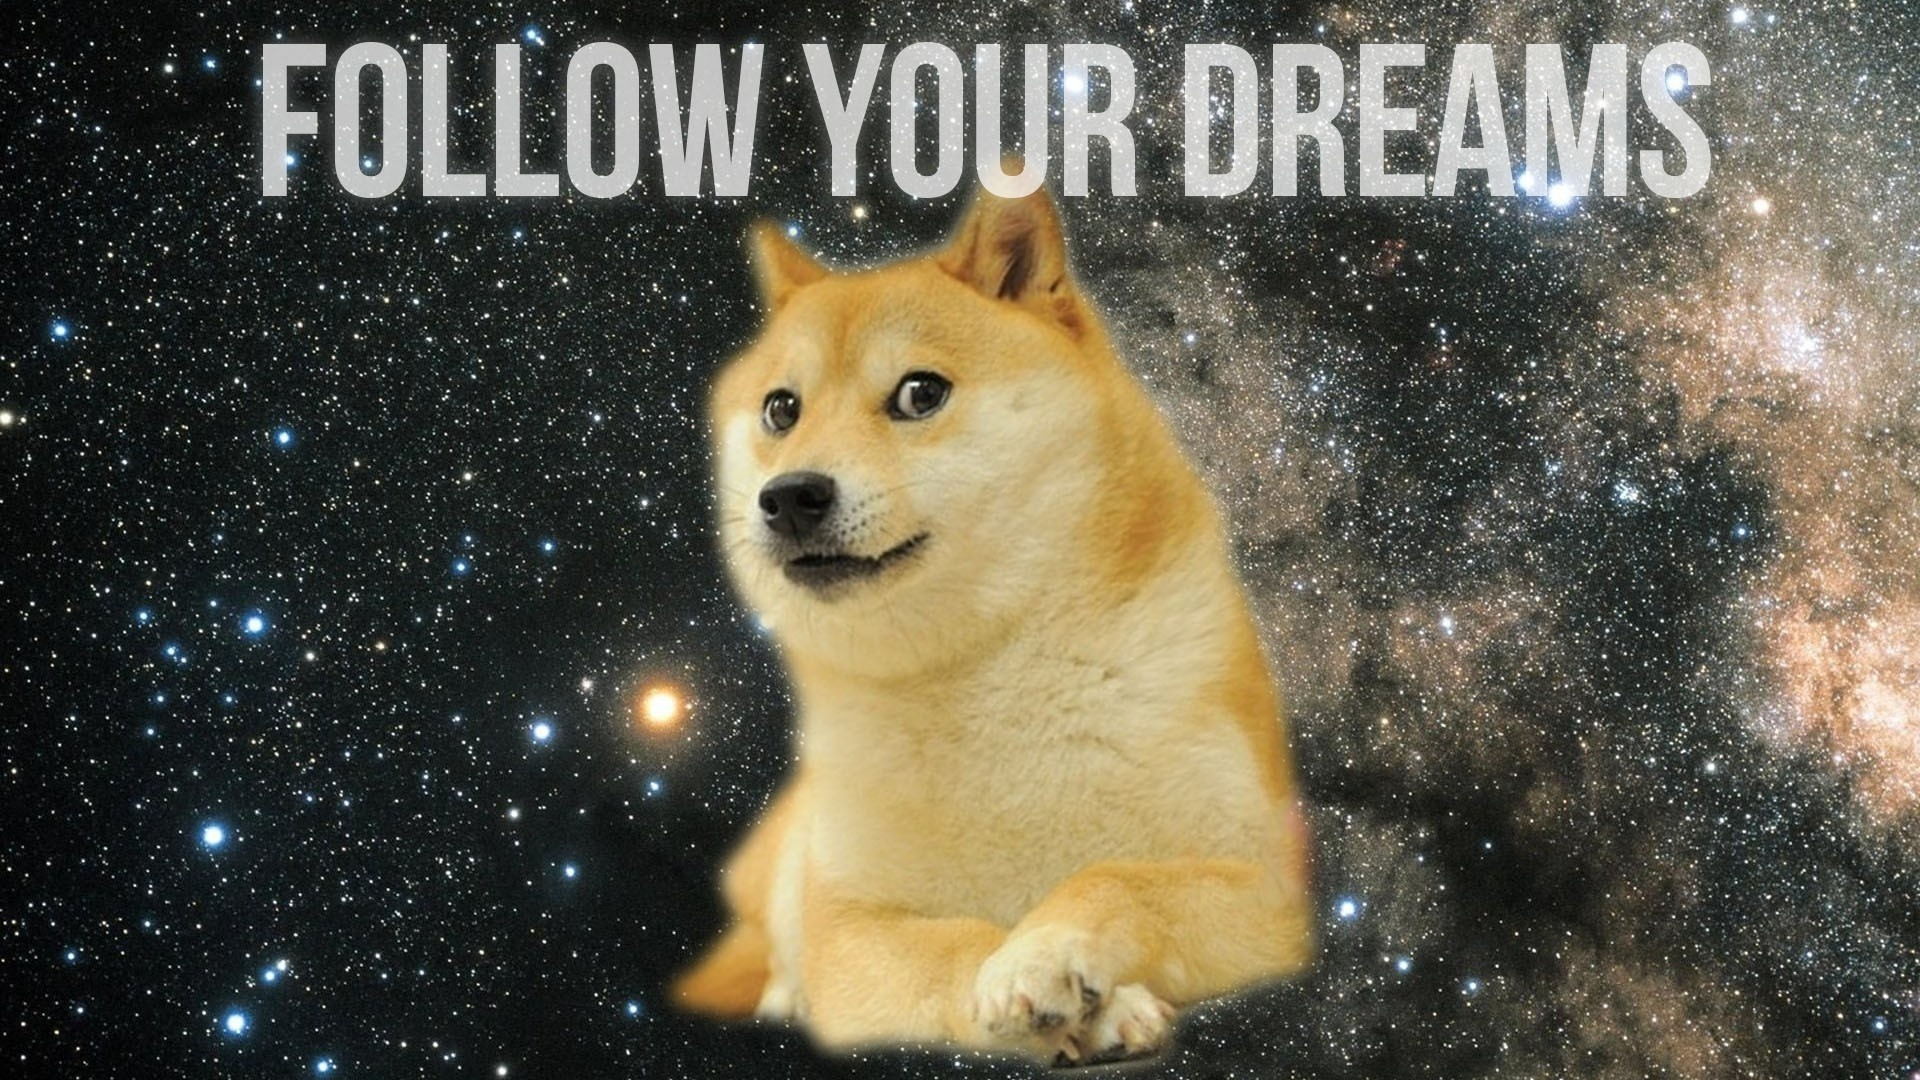 Doge Meme background wallpaper